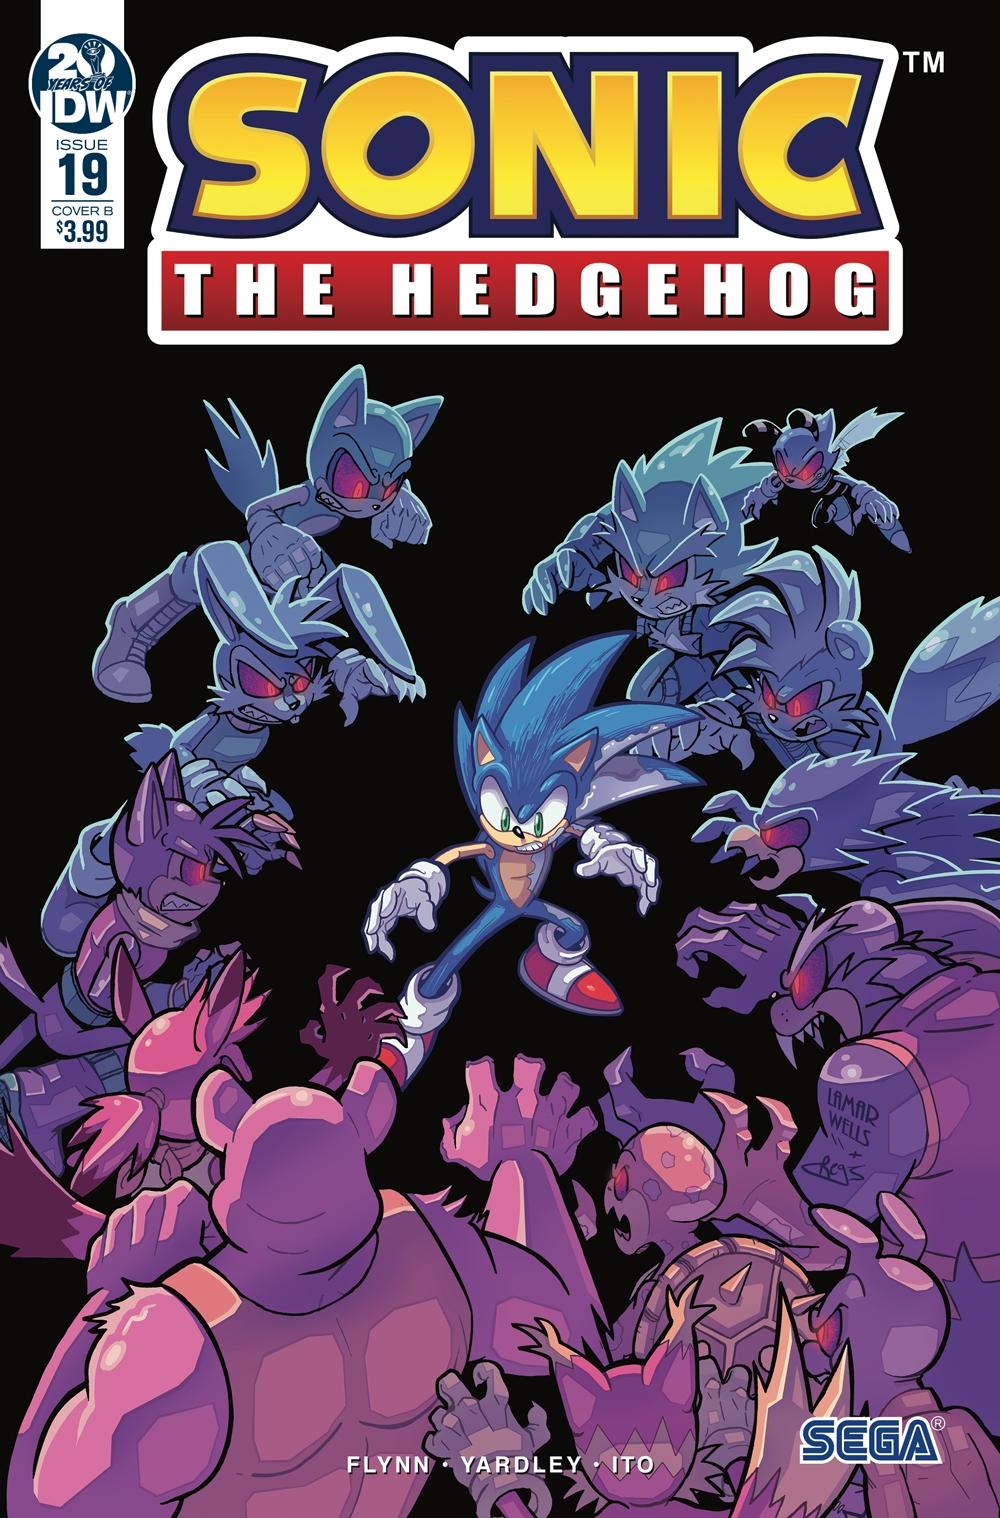 Sonic The Hedgehog #19 Cover B